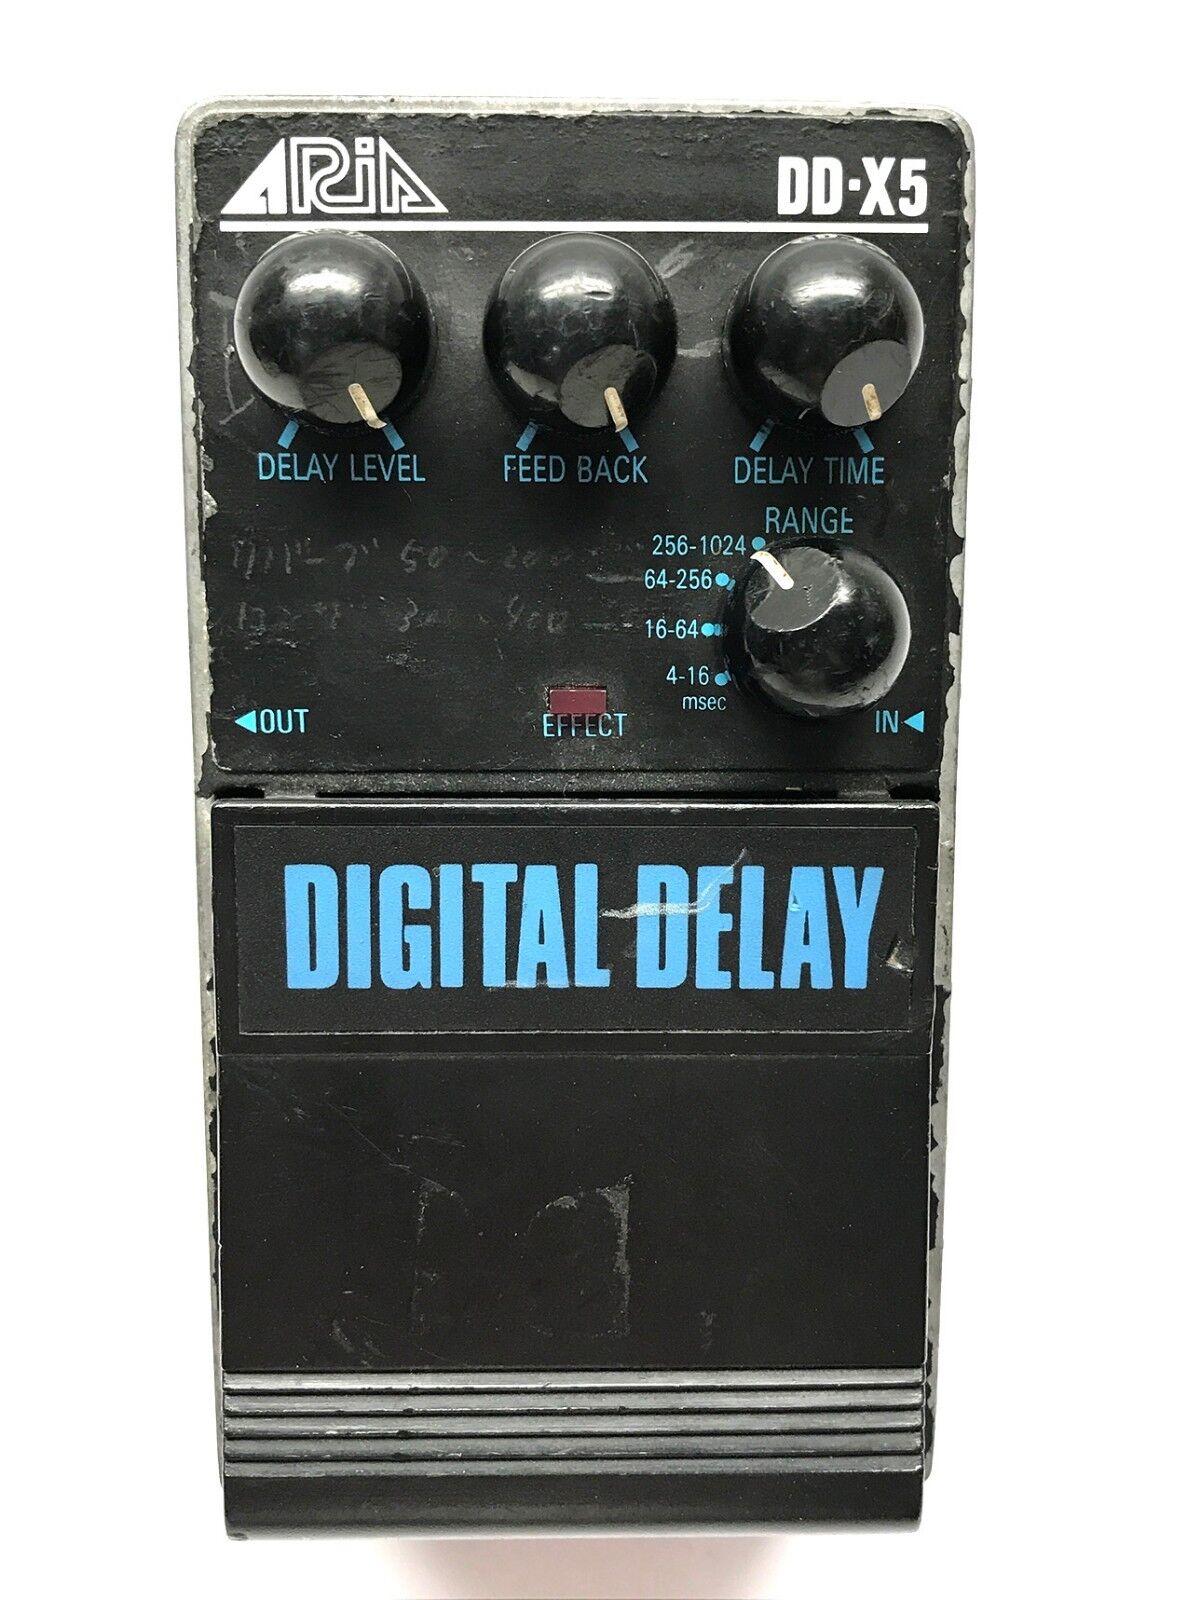 Aria DD-X5, Digital Delay, Pro II Series 5 1985-late 80's, Made In Japan Vintage